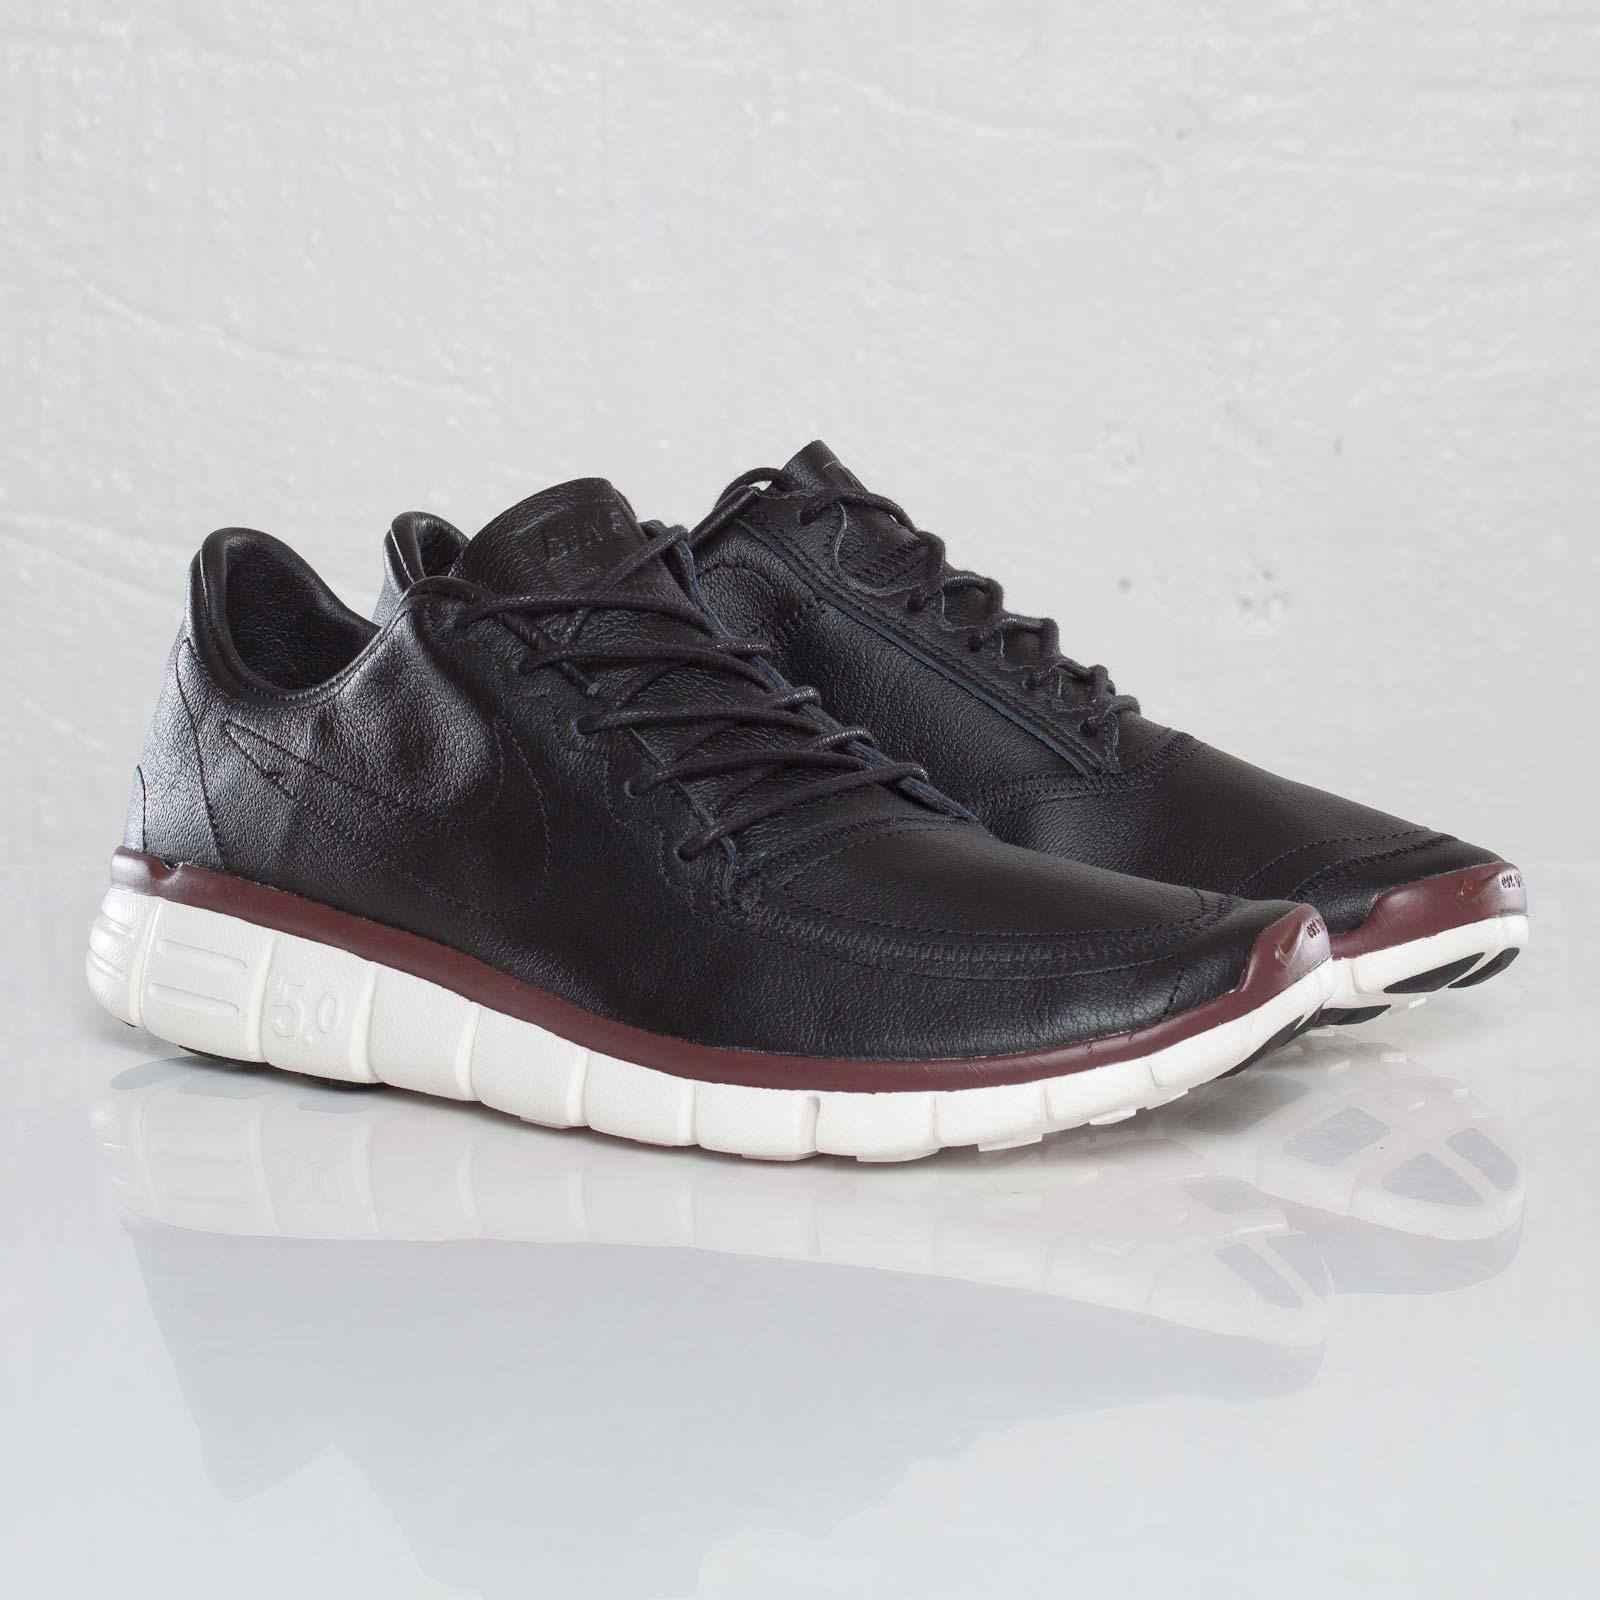 Nike Free 5.0 V4 Deconstruct - 110644 - Sneakersnstuff  319b64310